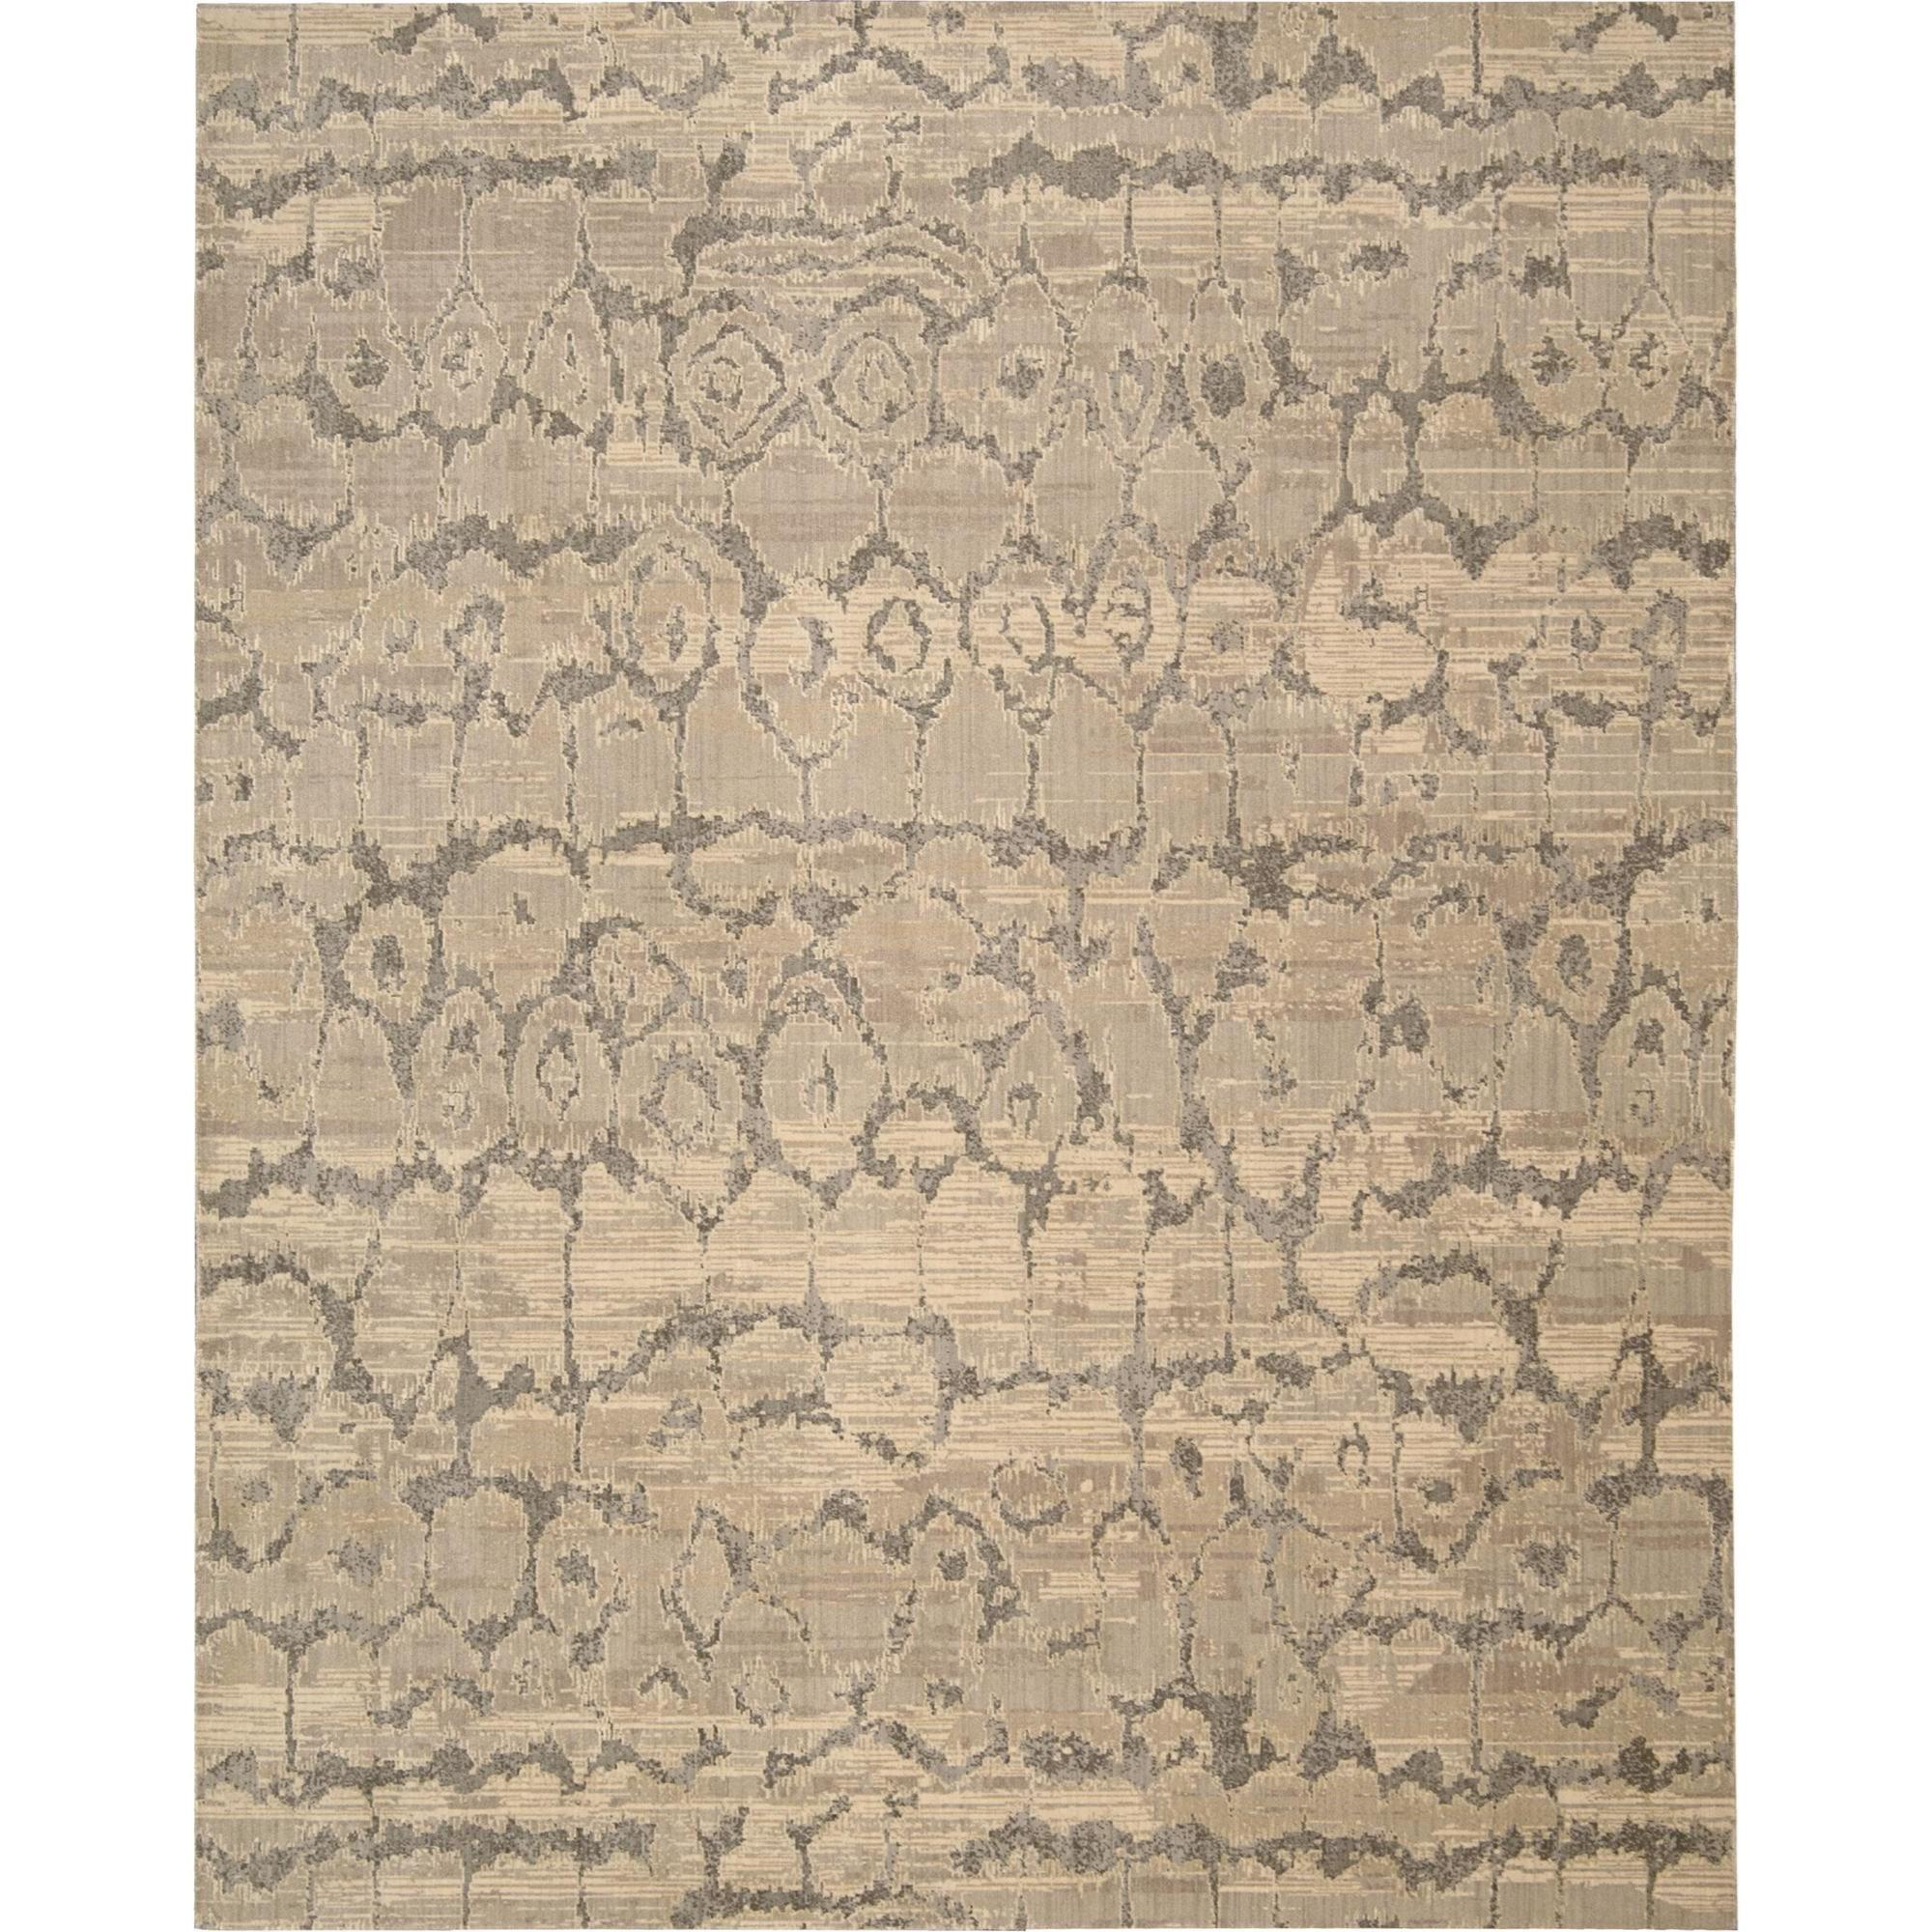 Nourison Silken Allure 12' x 15' Beige Area Rug - Item Number: 18270